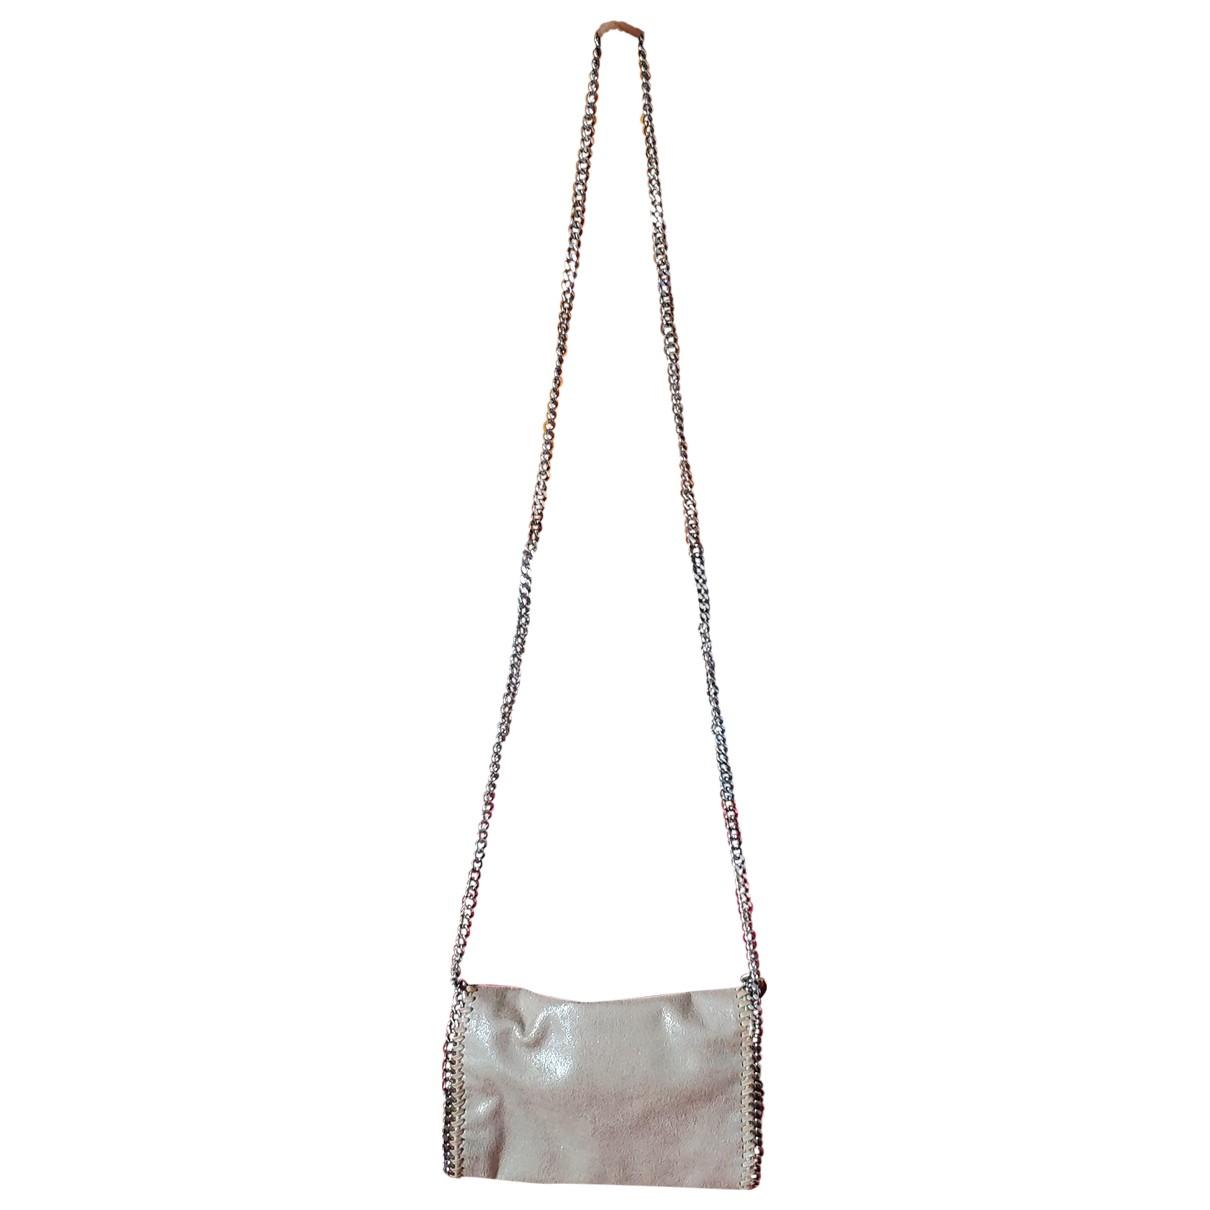 Stella Mccartney \N Handtasche in  Beige Synthetik